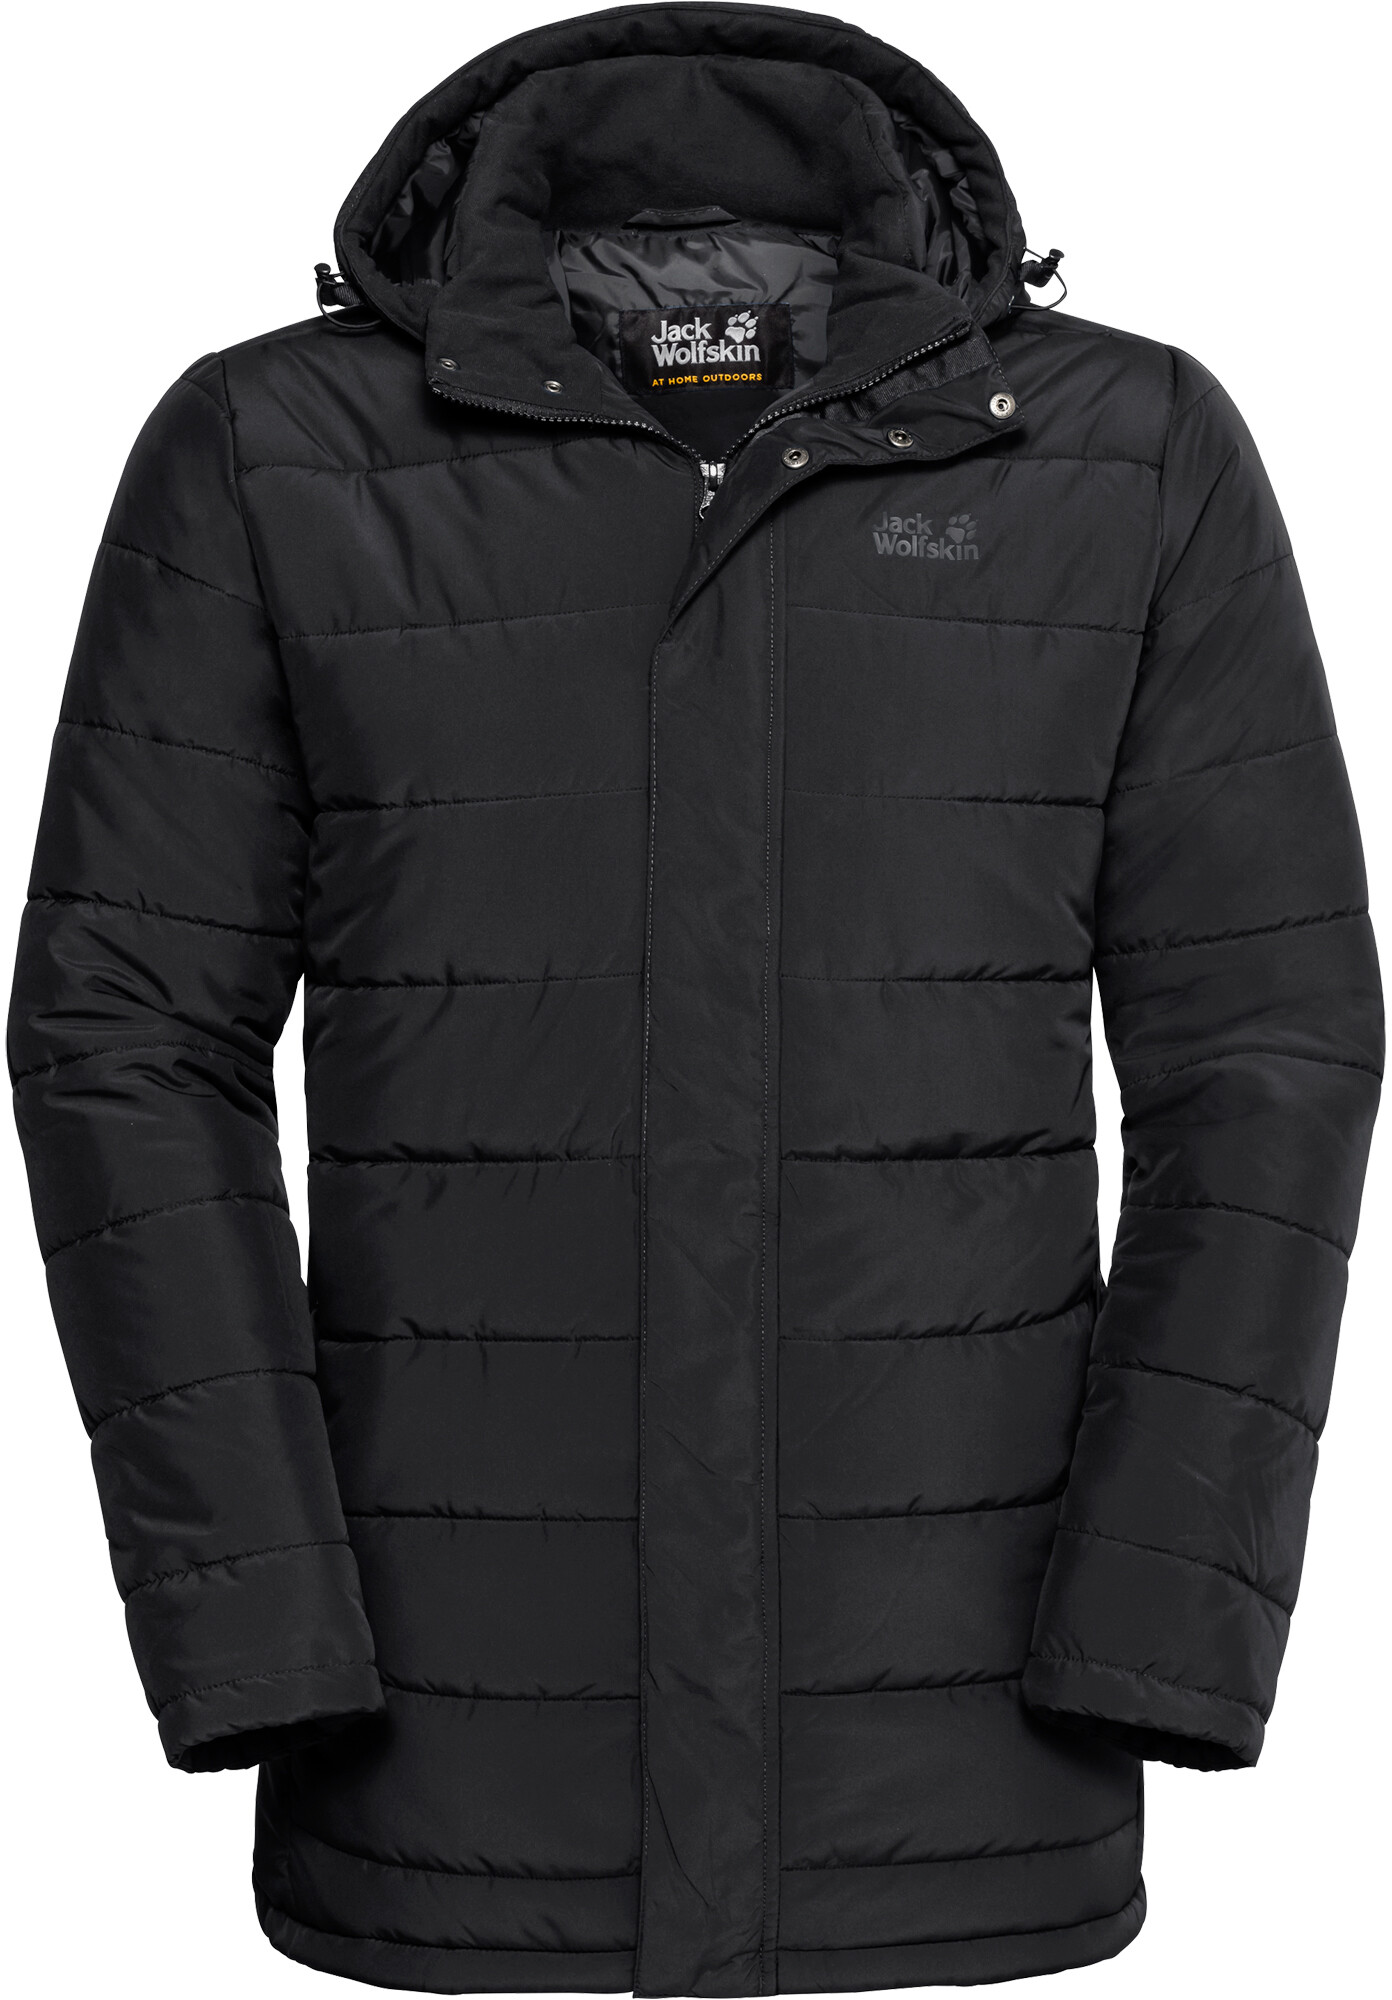 Jack Wolfskin Svalbard Coat Men black   campz.de b84618cf40